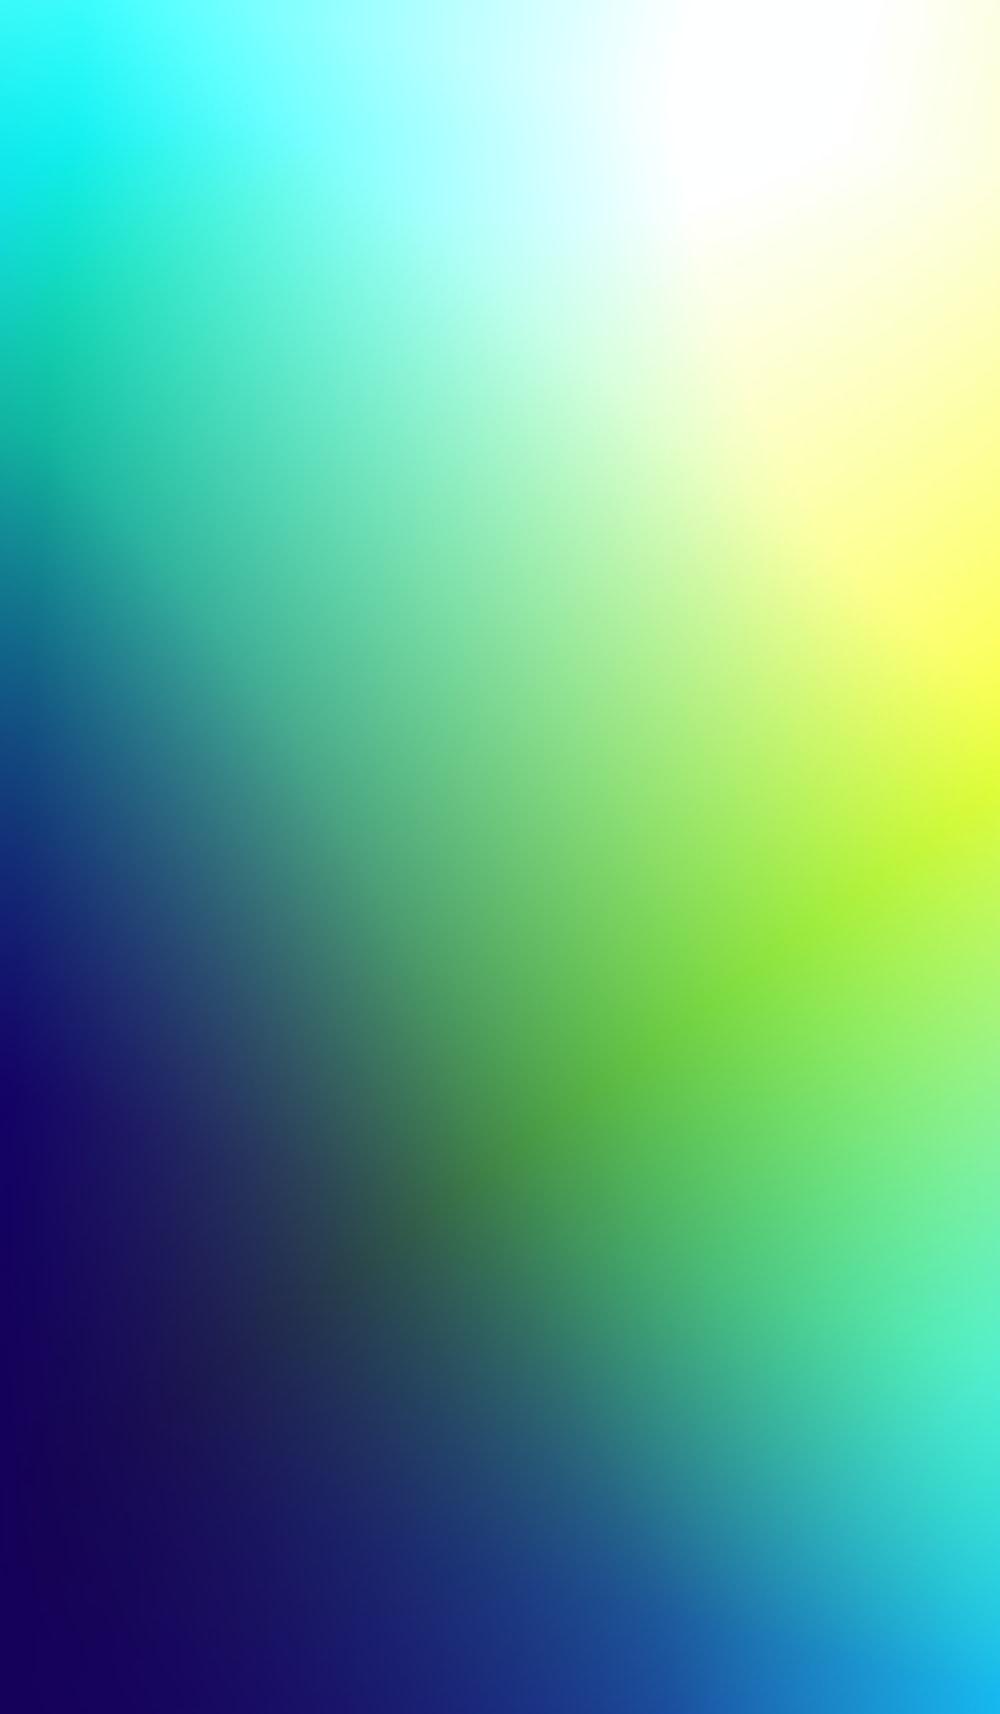 green and yellow light digital wallpaper